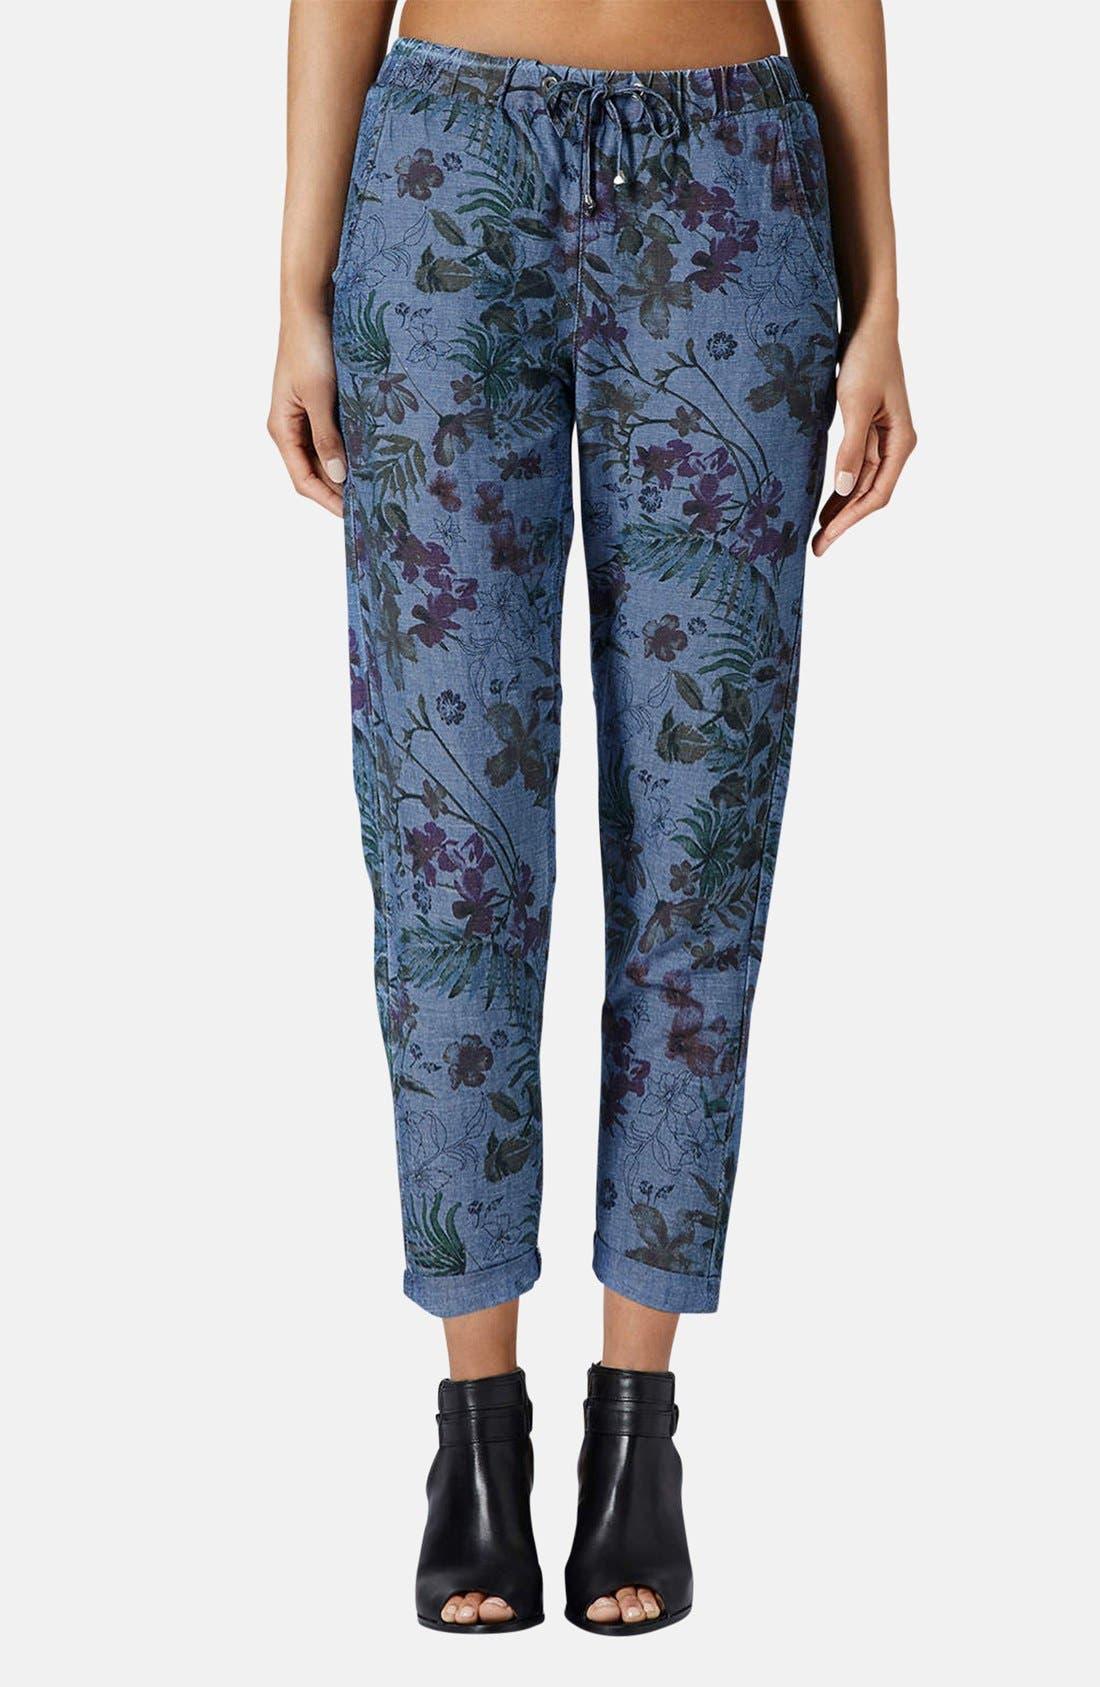 Alternate Image 1 Selected - Topshop Moto Floral Print Jogger Pants